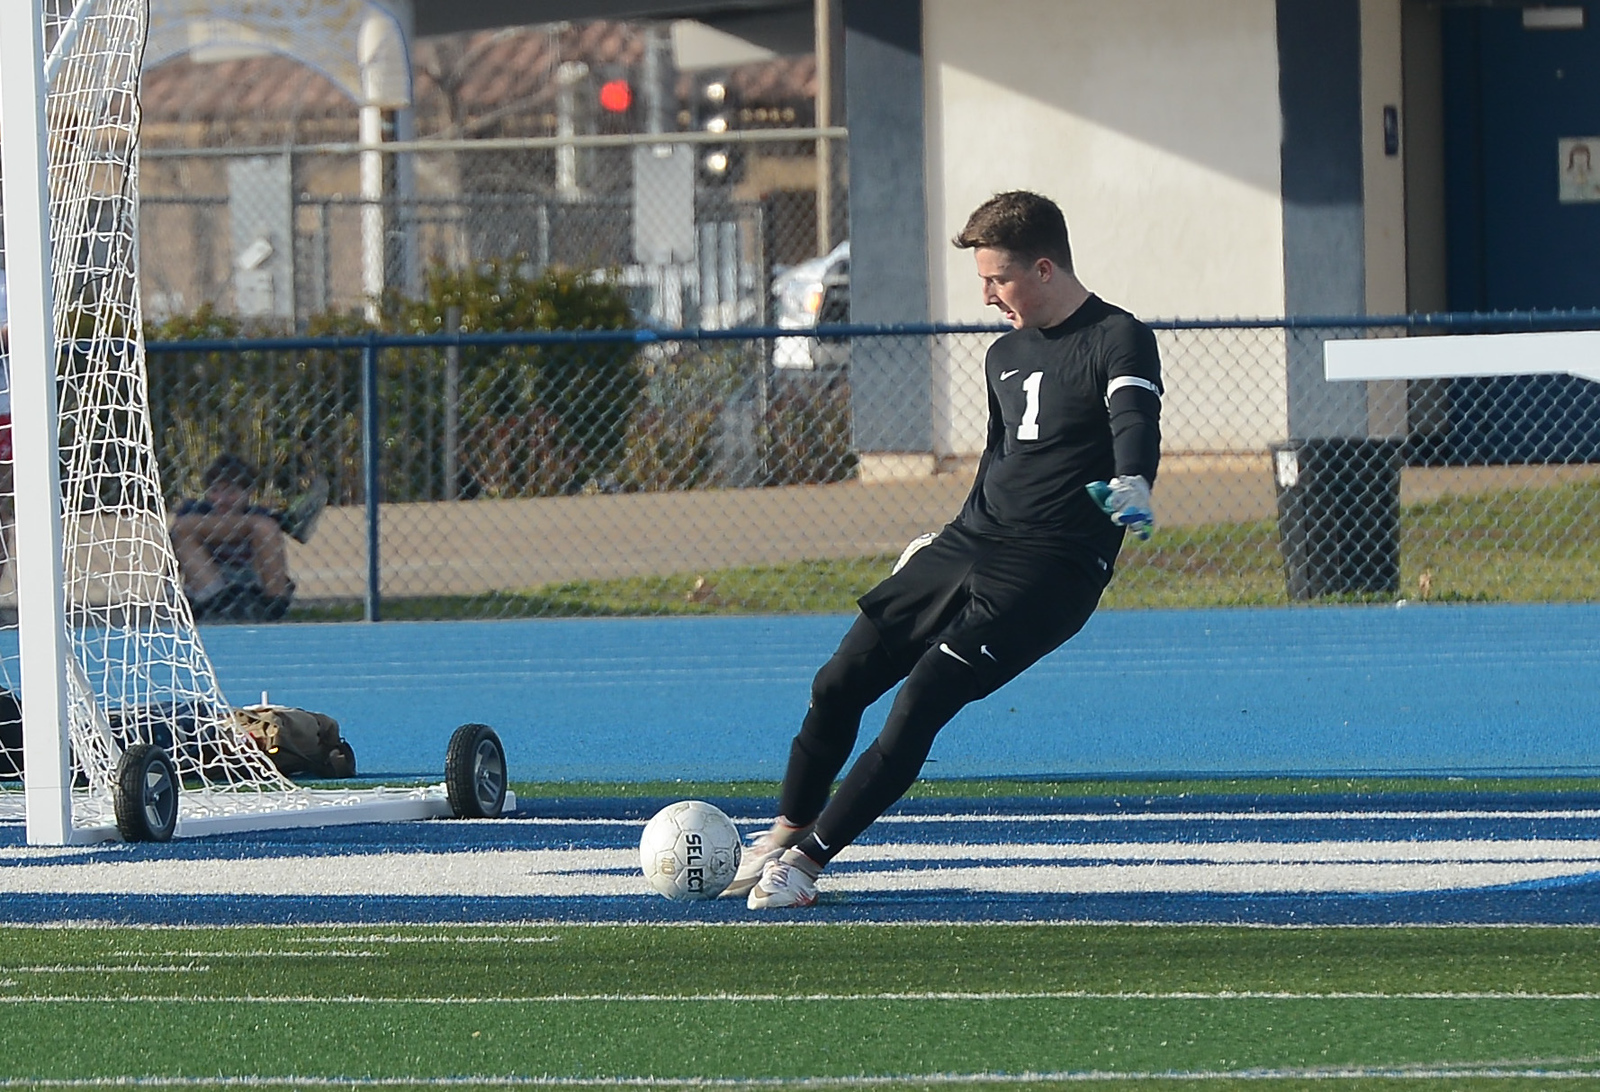 Pleasant Valley High's Austin Mathews (1) kicks the ball, Thursday, March 8, 2018, in Chico, California. (Carin Dorghalli -- Enterprise-Record)